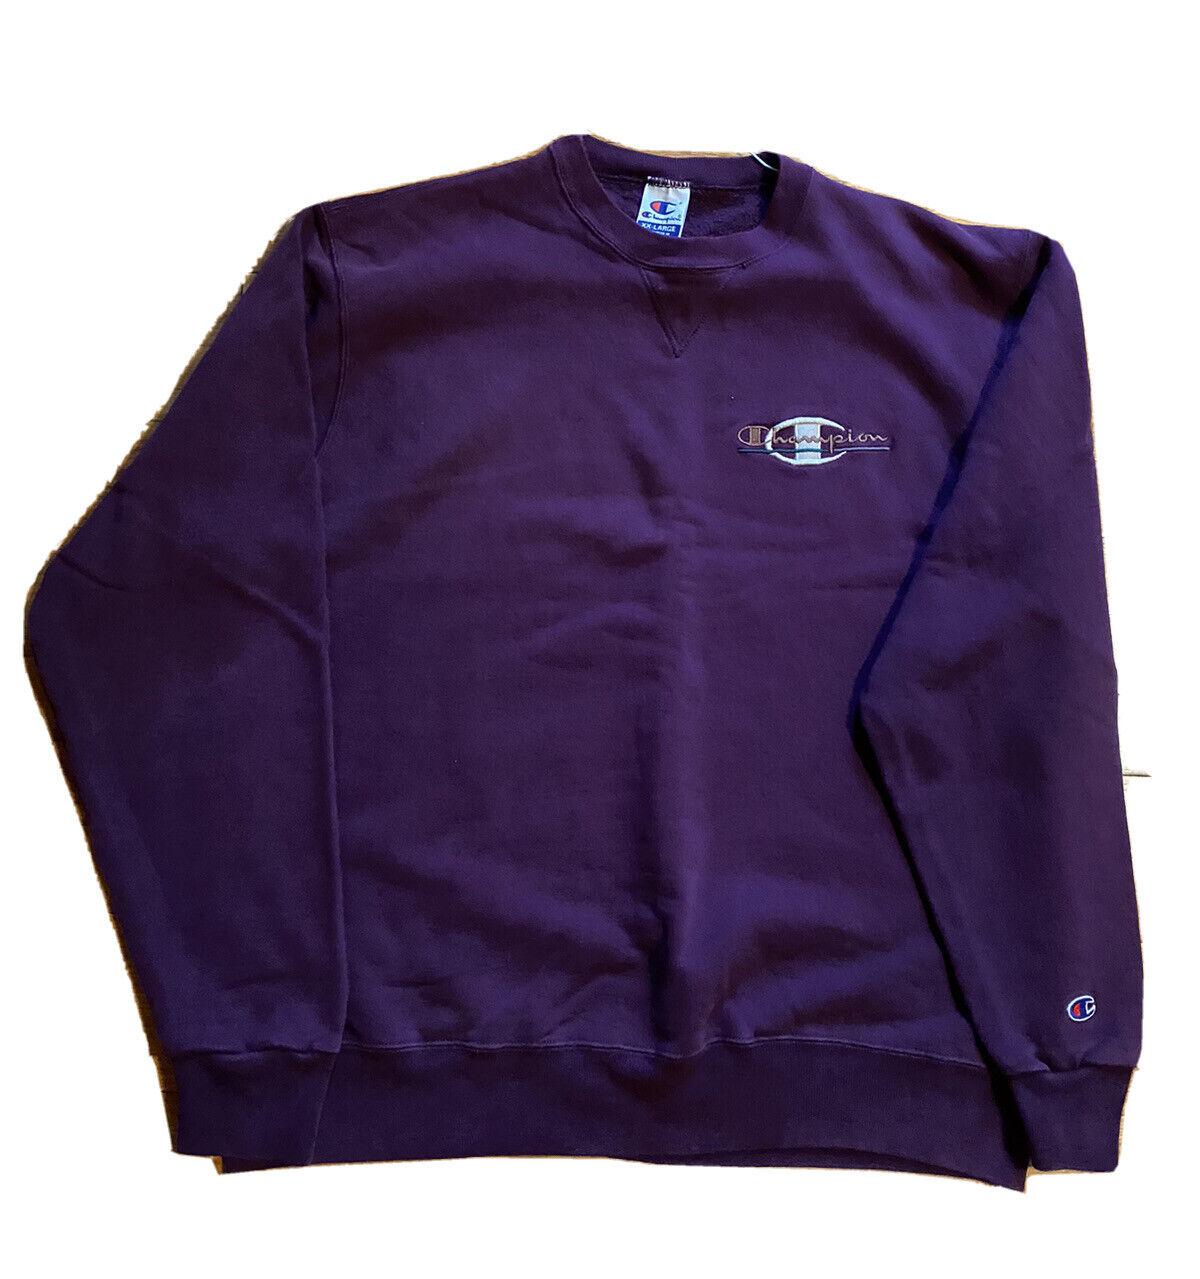 Vintage Rare Champion Crewneck Sweatshirt Spell Out Purple Womens XXL